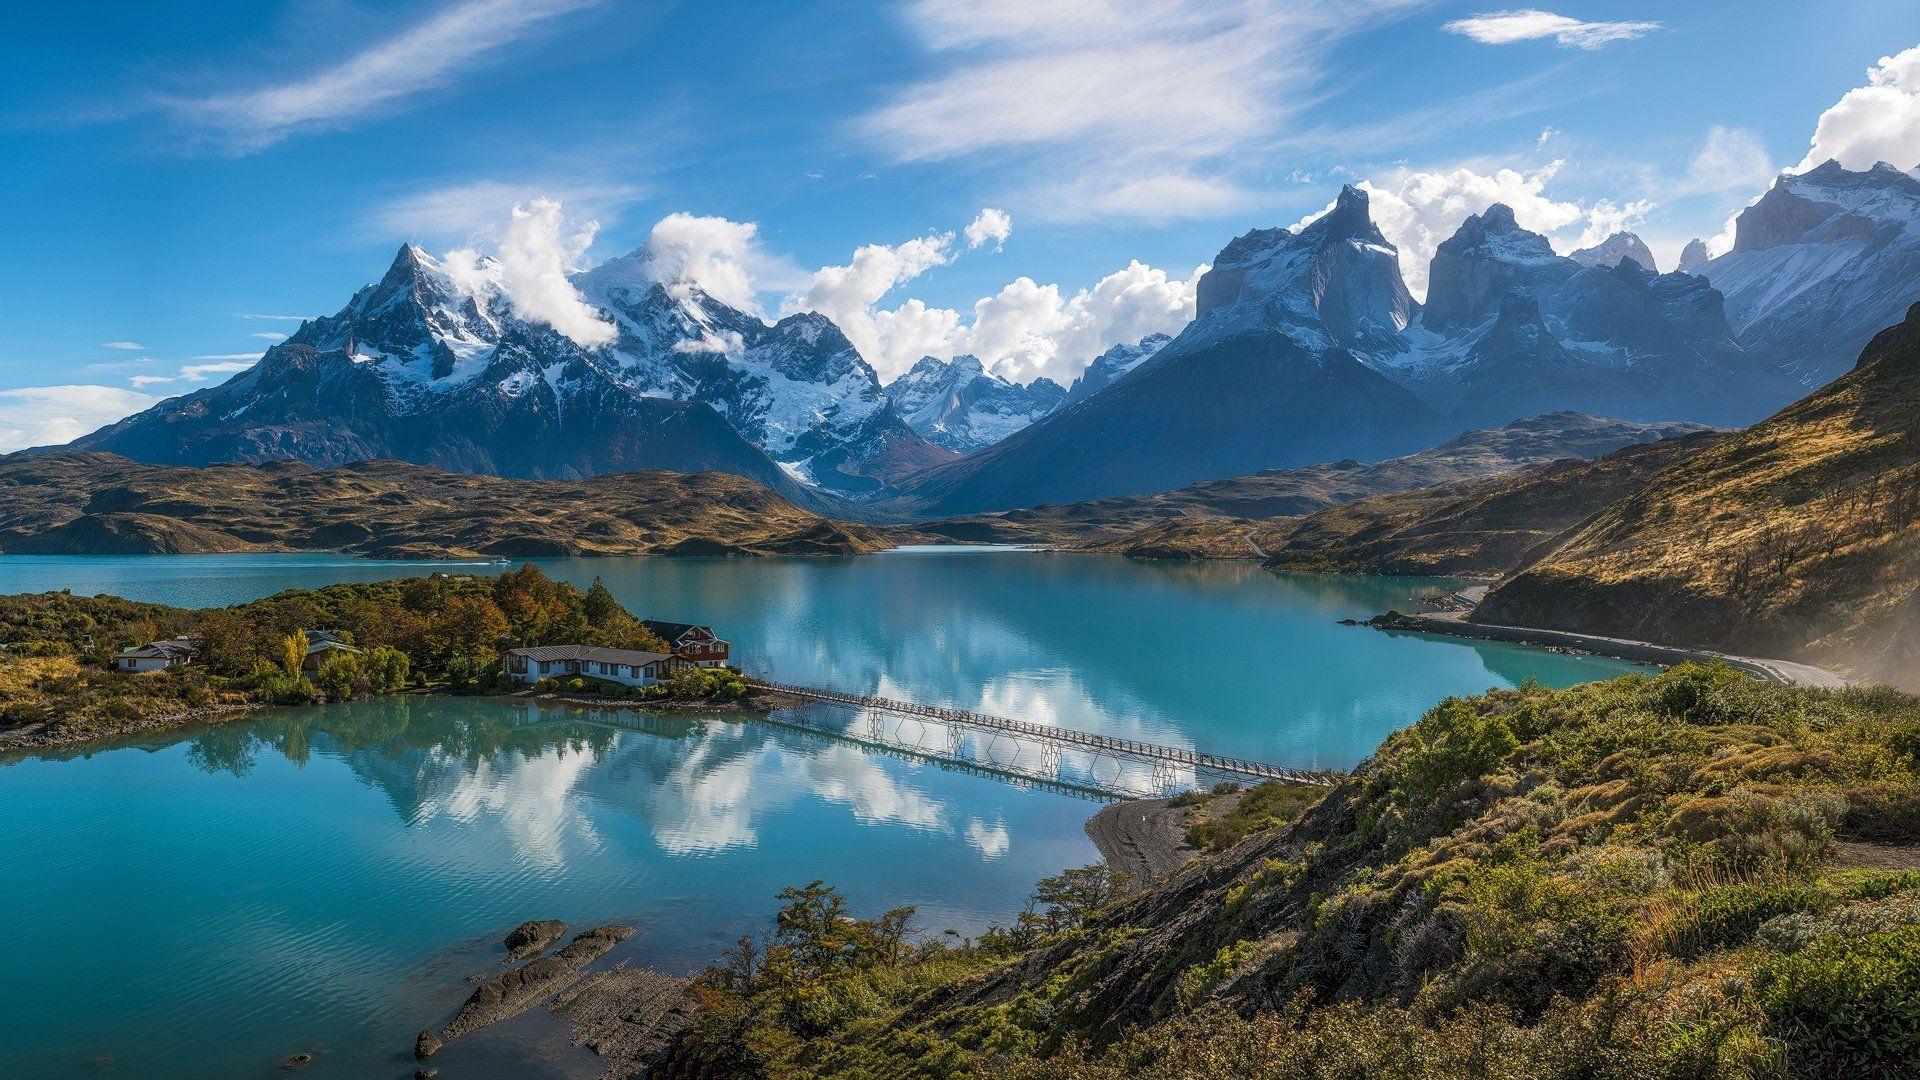 south america chile patagonia andes mountains lake bridge island